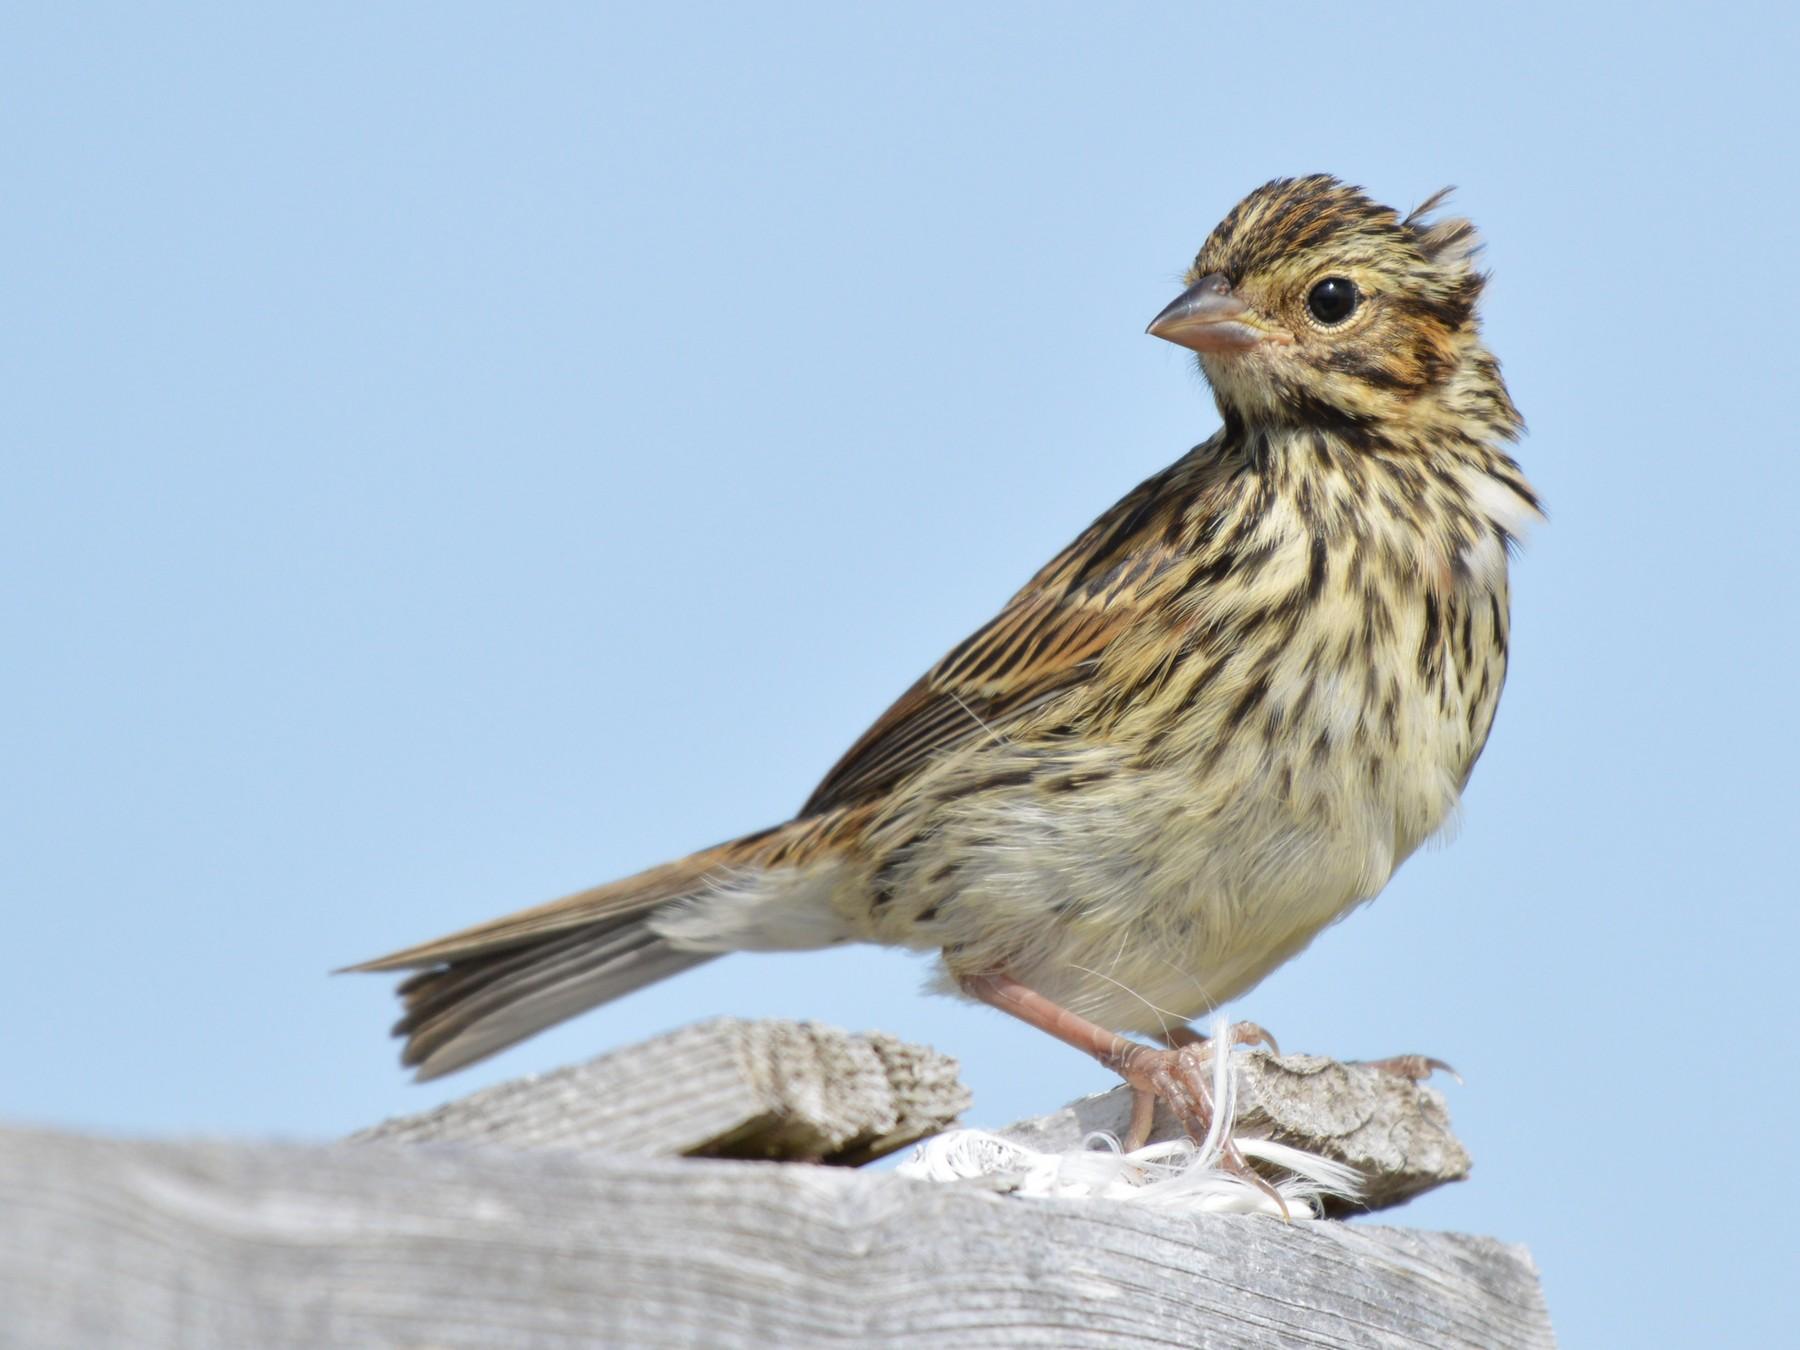 Savannah Sparrow - Kathy Marche